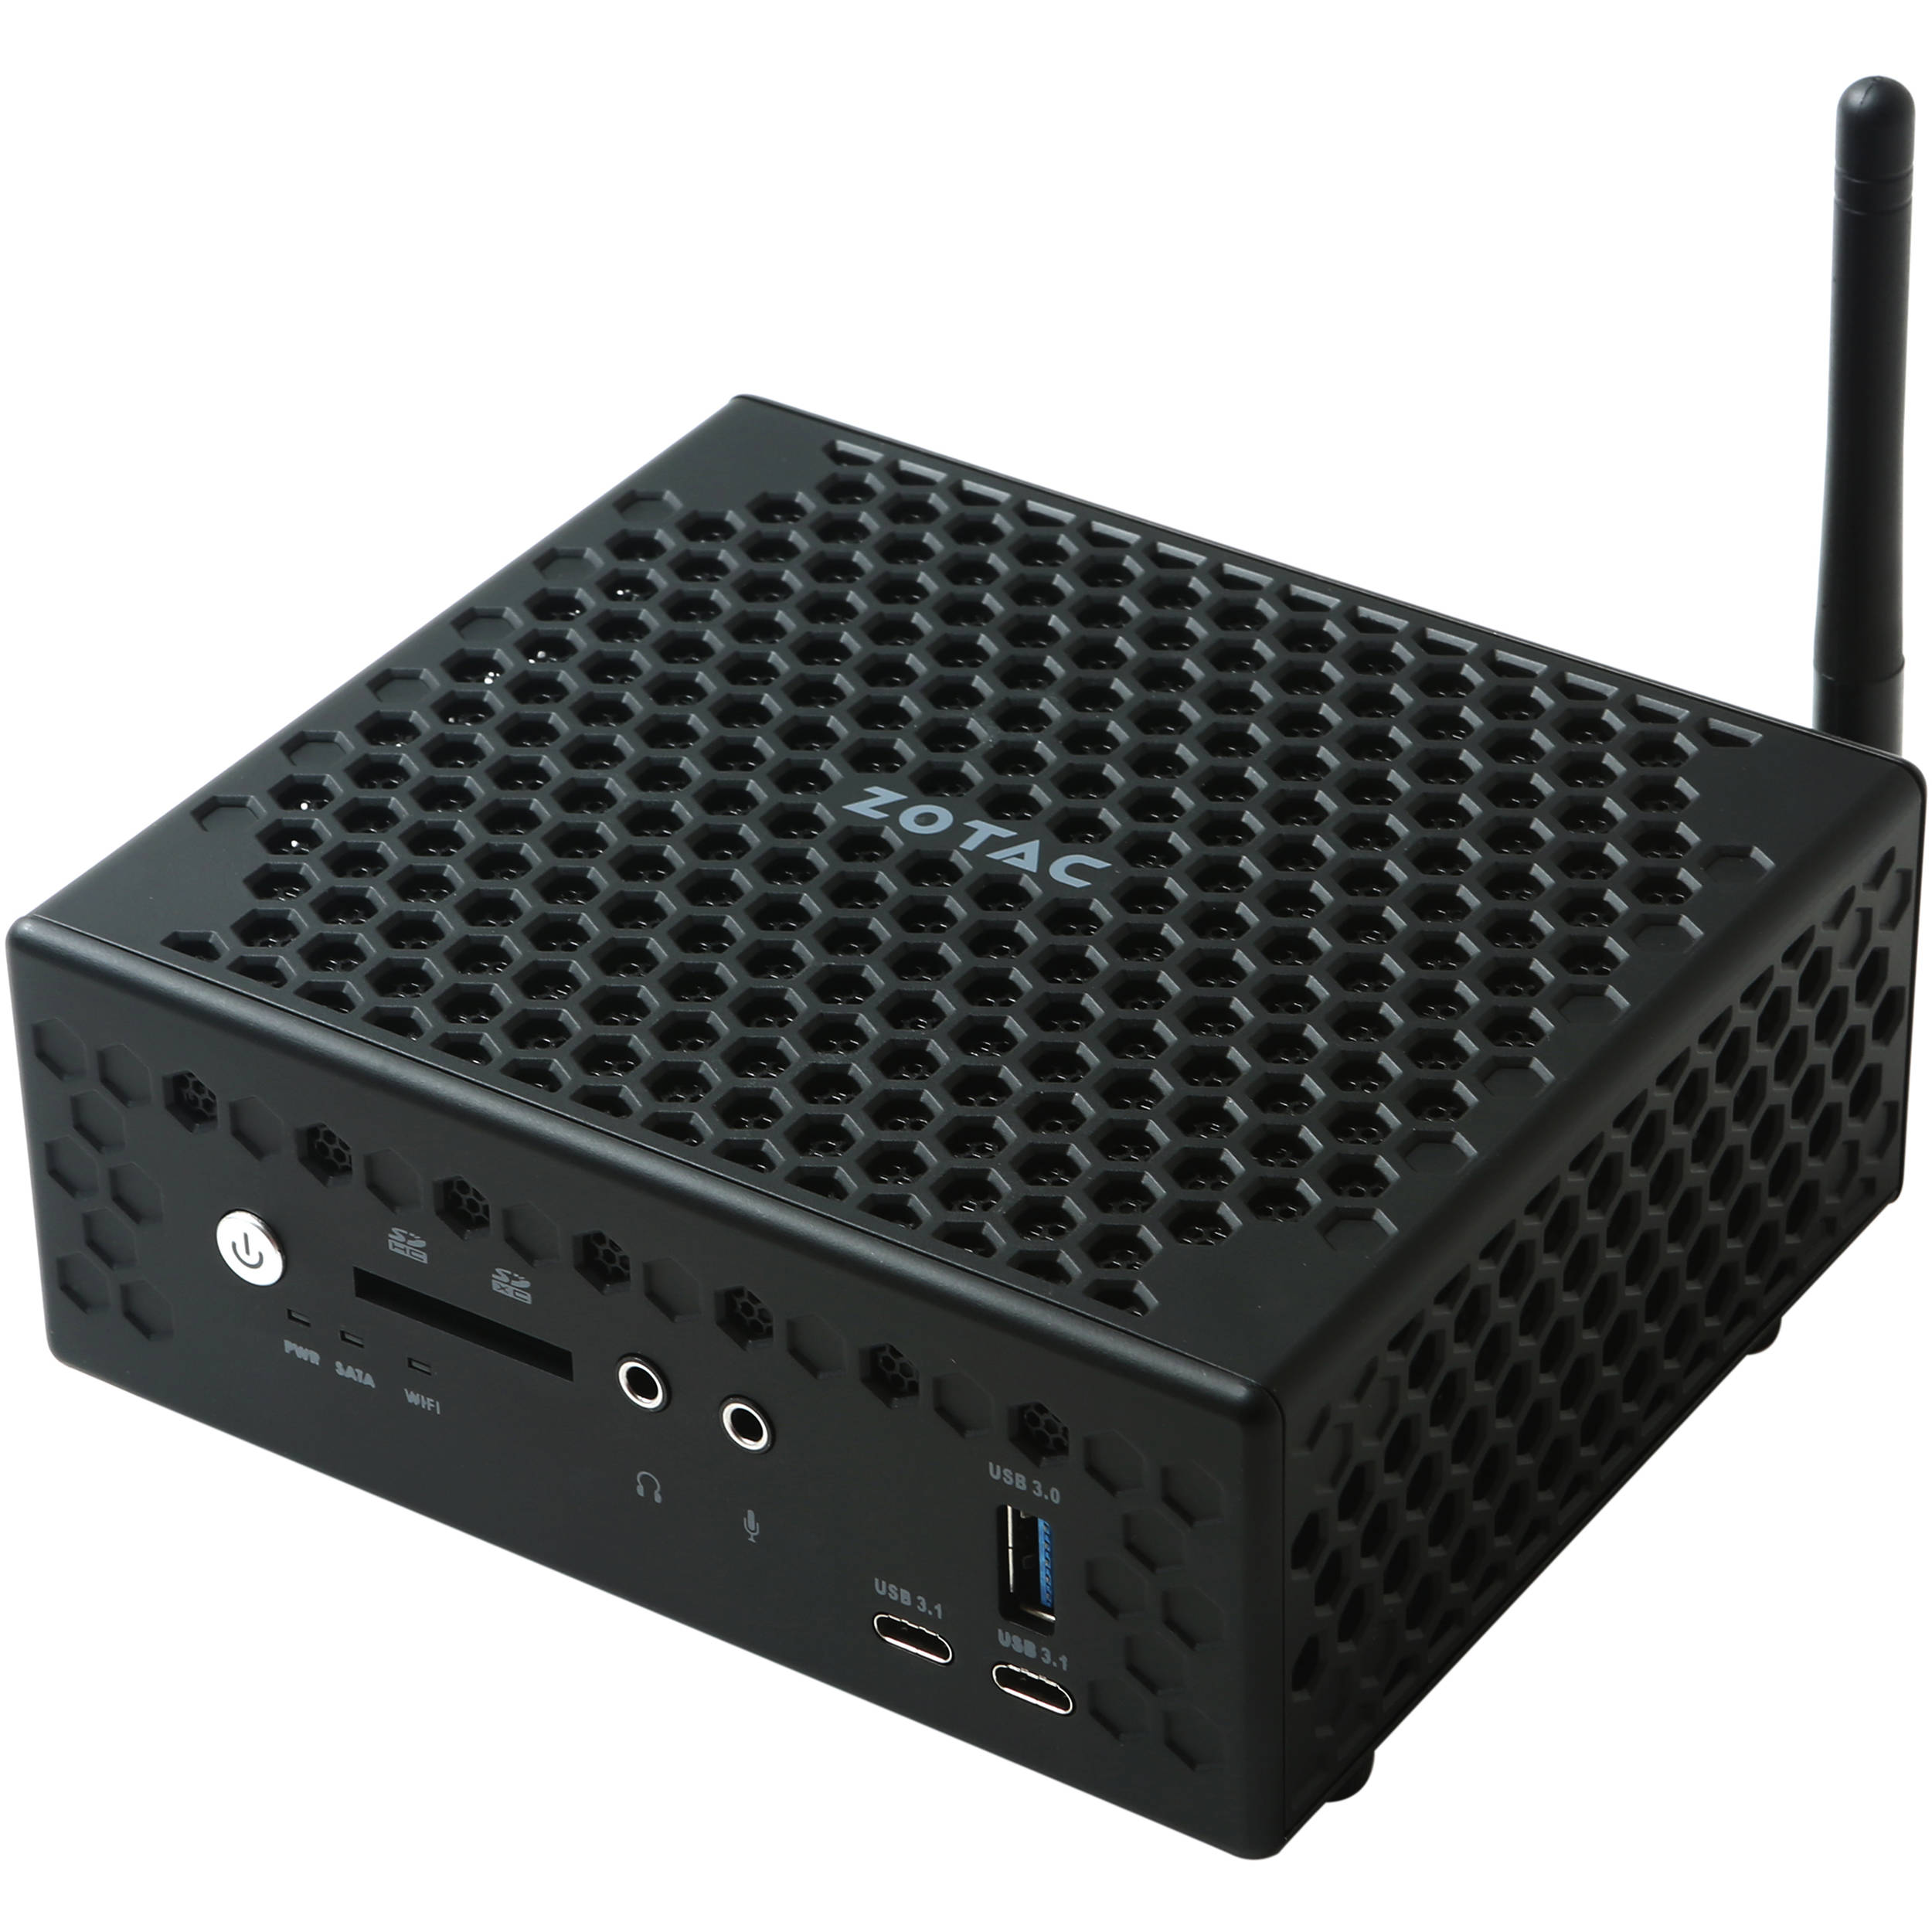 ZOTAC ZBOX CI527 nano Mini Desktop Computer